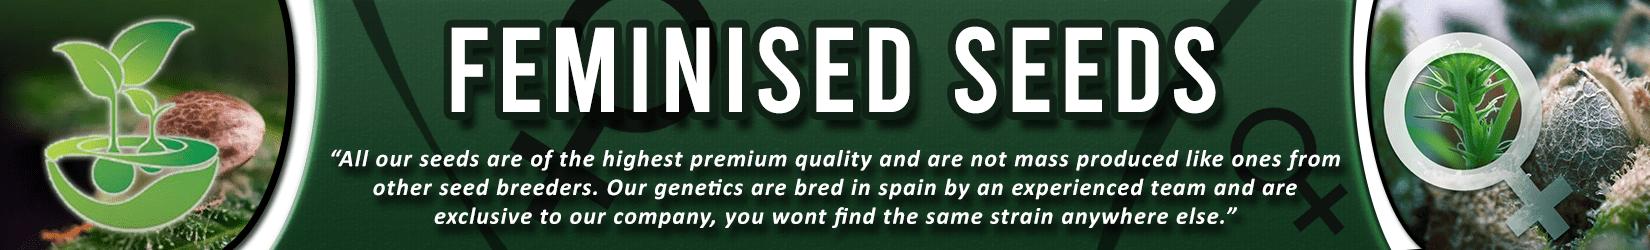 Cannabis Seeds Breeder - Feminized Seeds